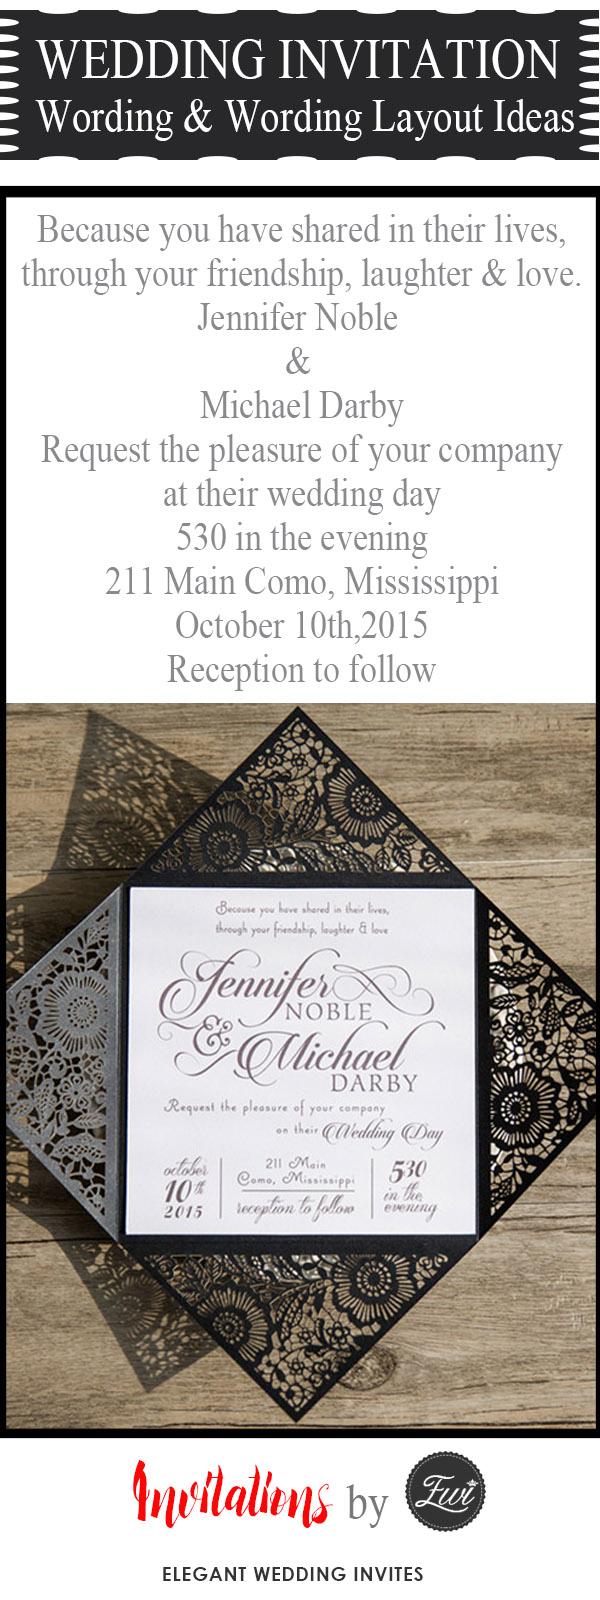 Diy Wedding Invitations Templates 20 Popular Wedding Invitation Wording Diy Templates Ideas